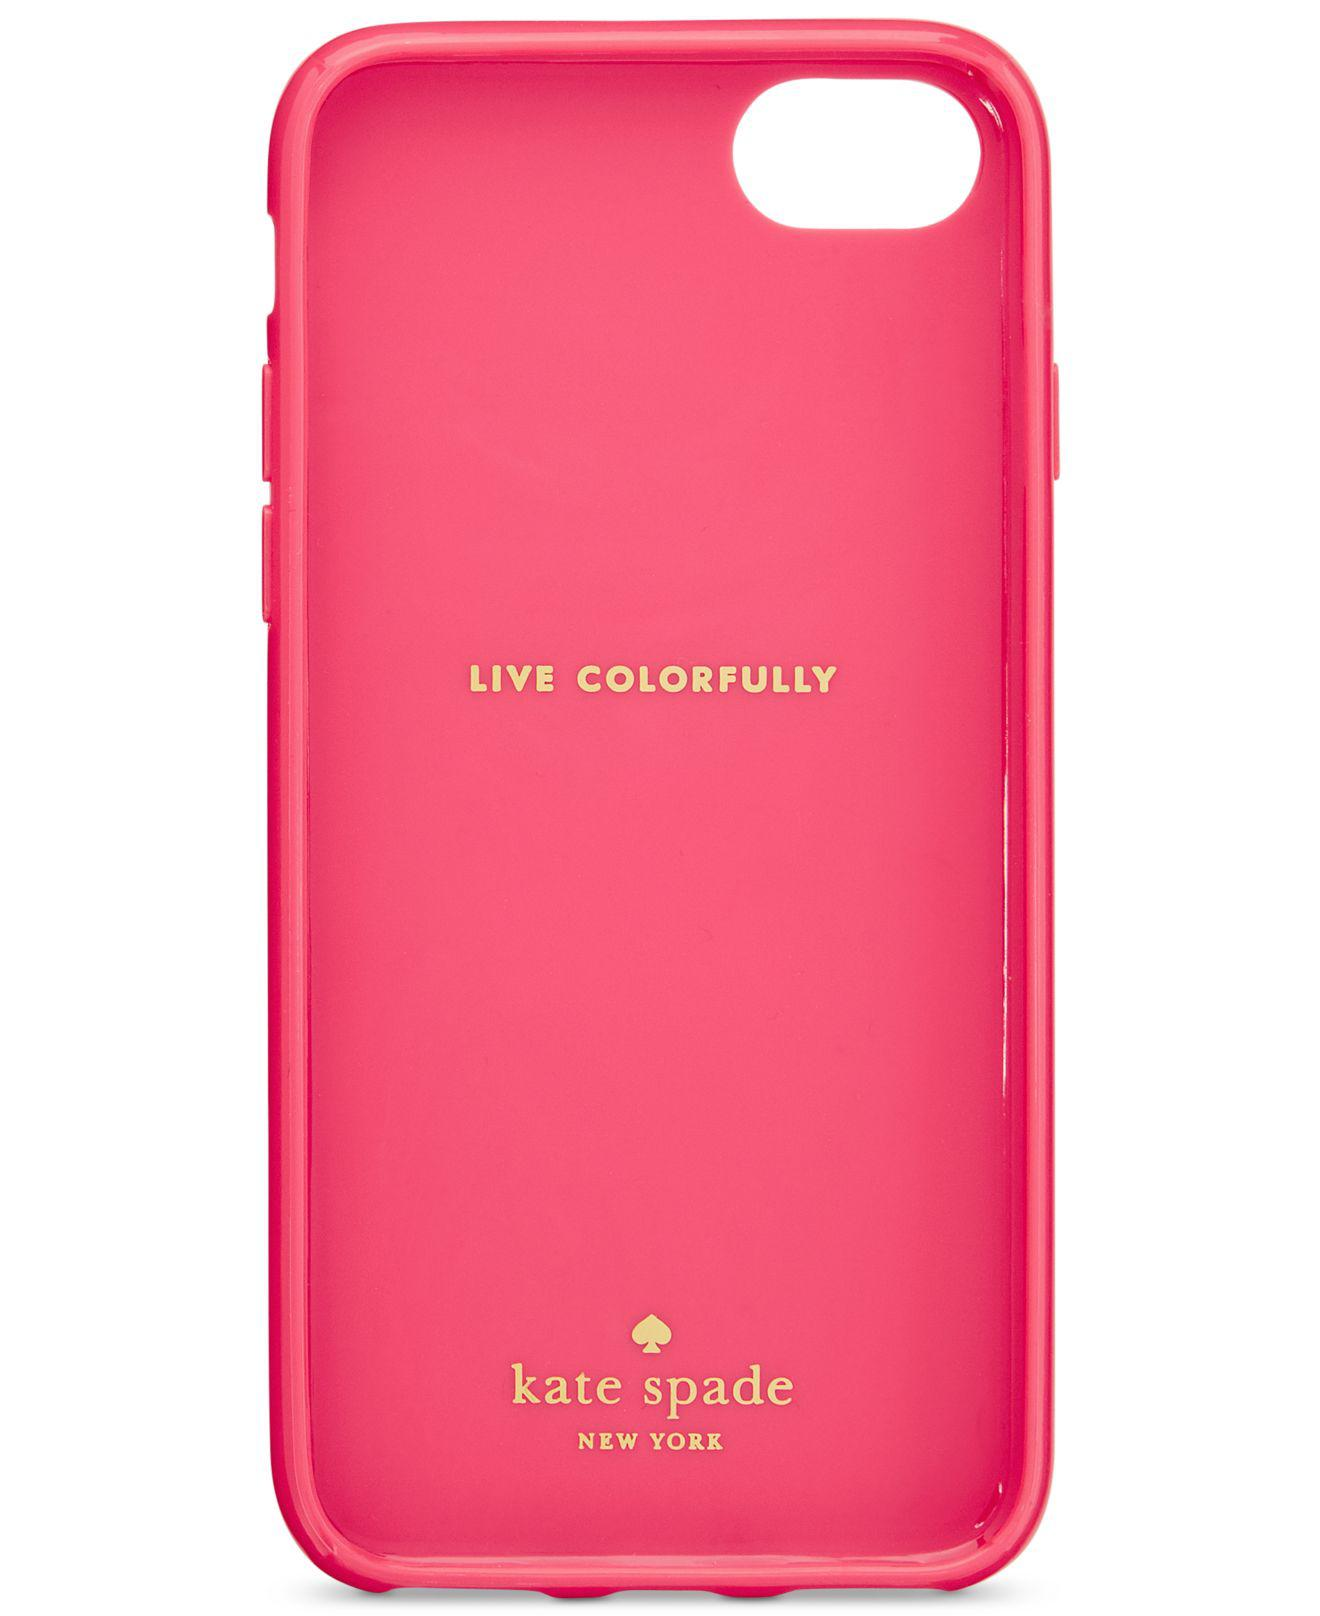 Lyst - Kate Spade Antoine Iphone 8 Case 1dc16b64c144d